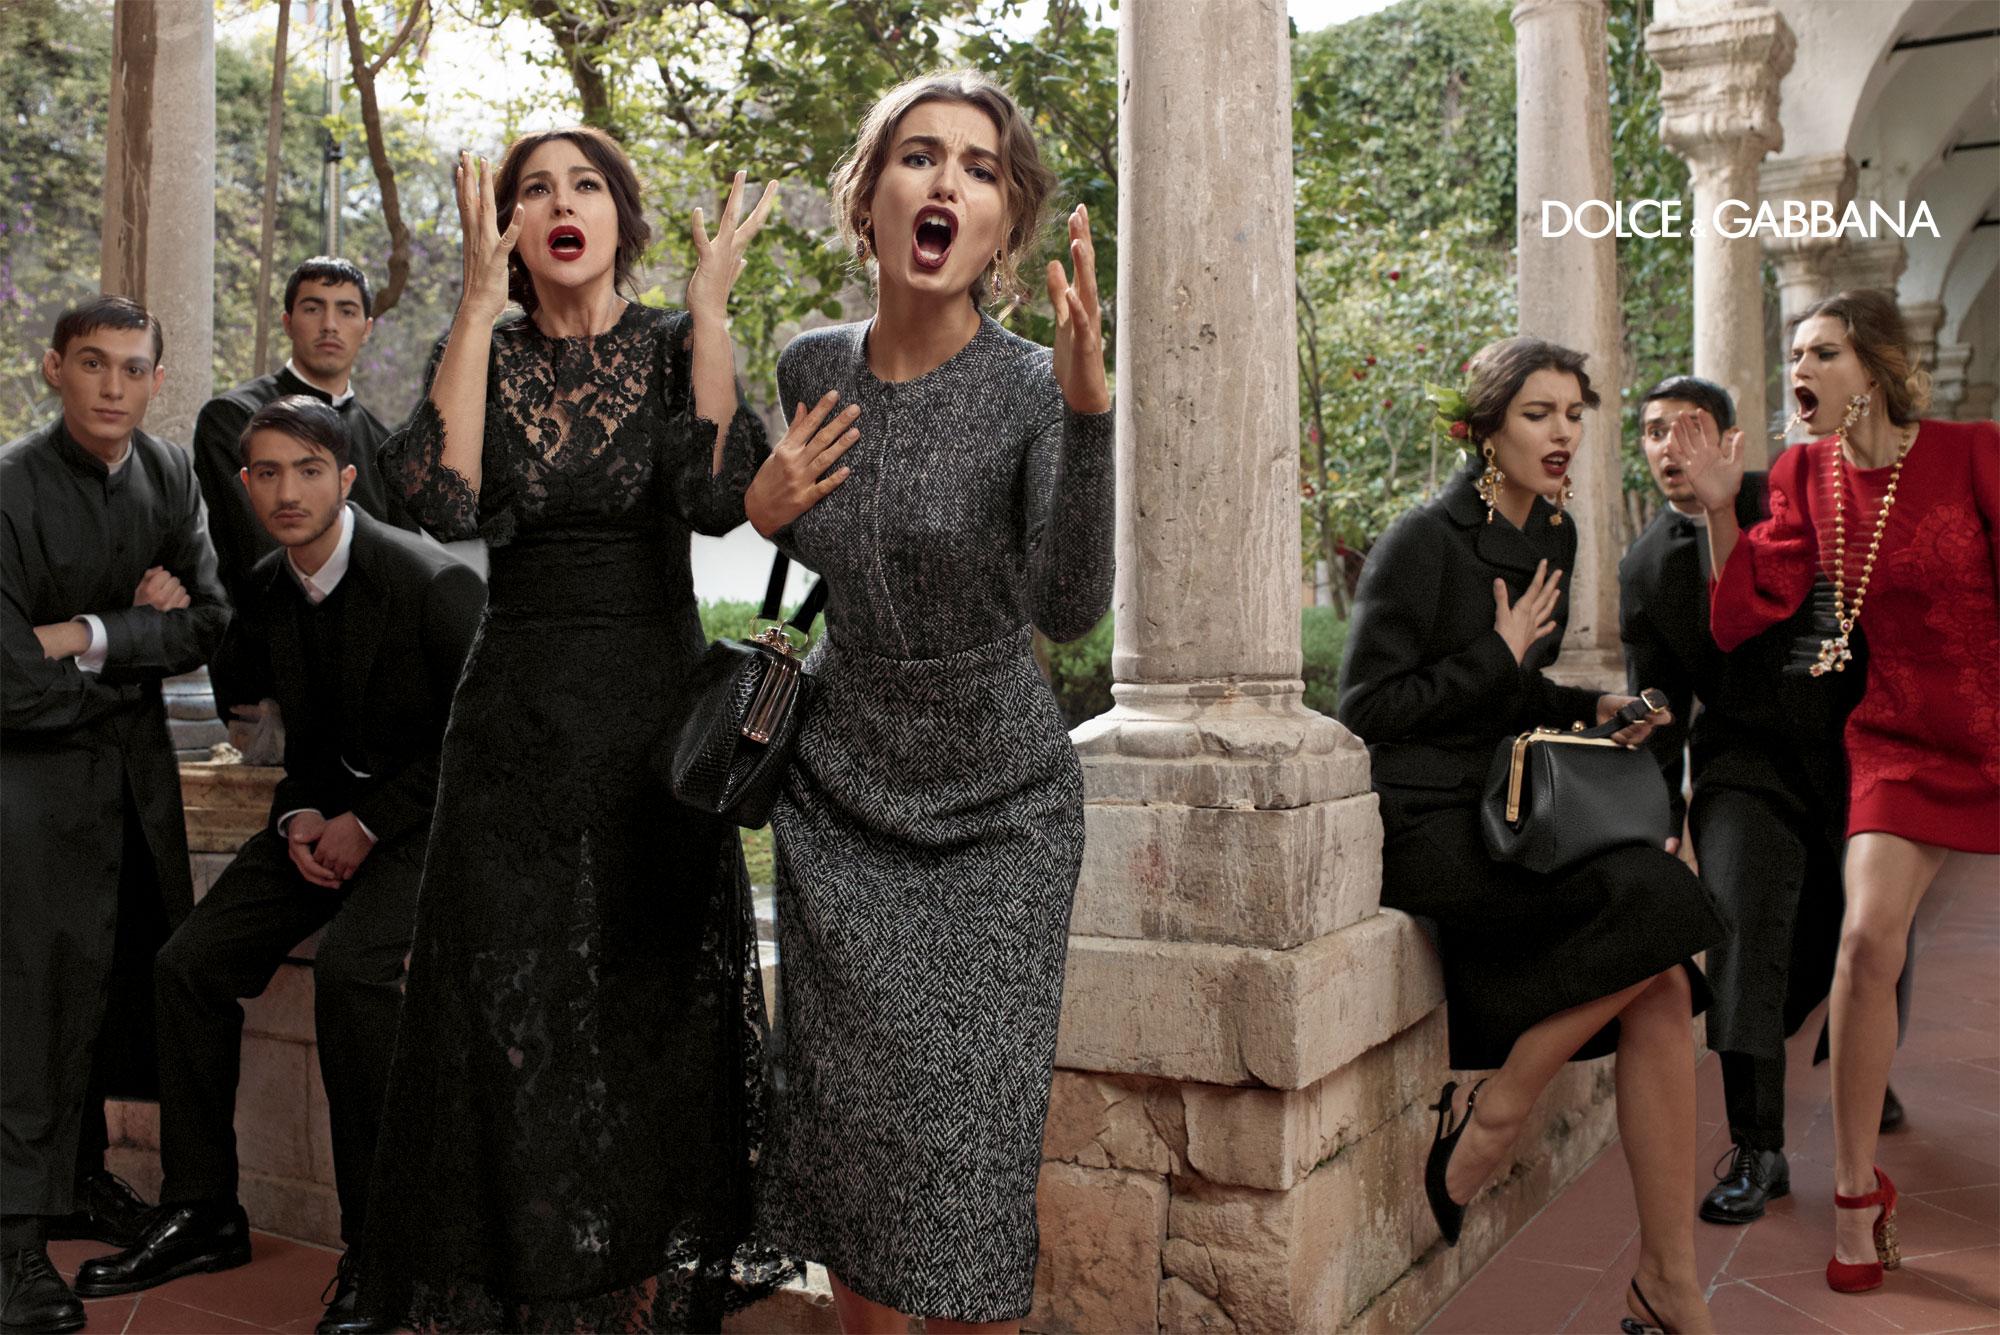 dolce-and-gabbana-fw-2014-women-adv-campaign-3